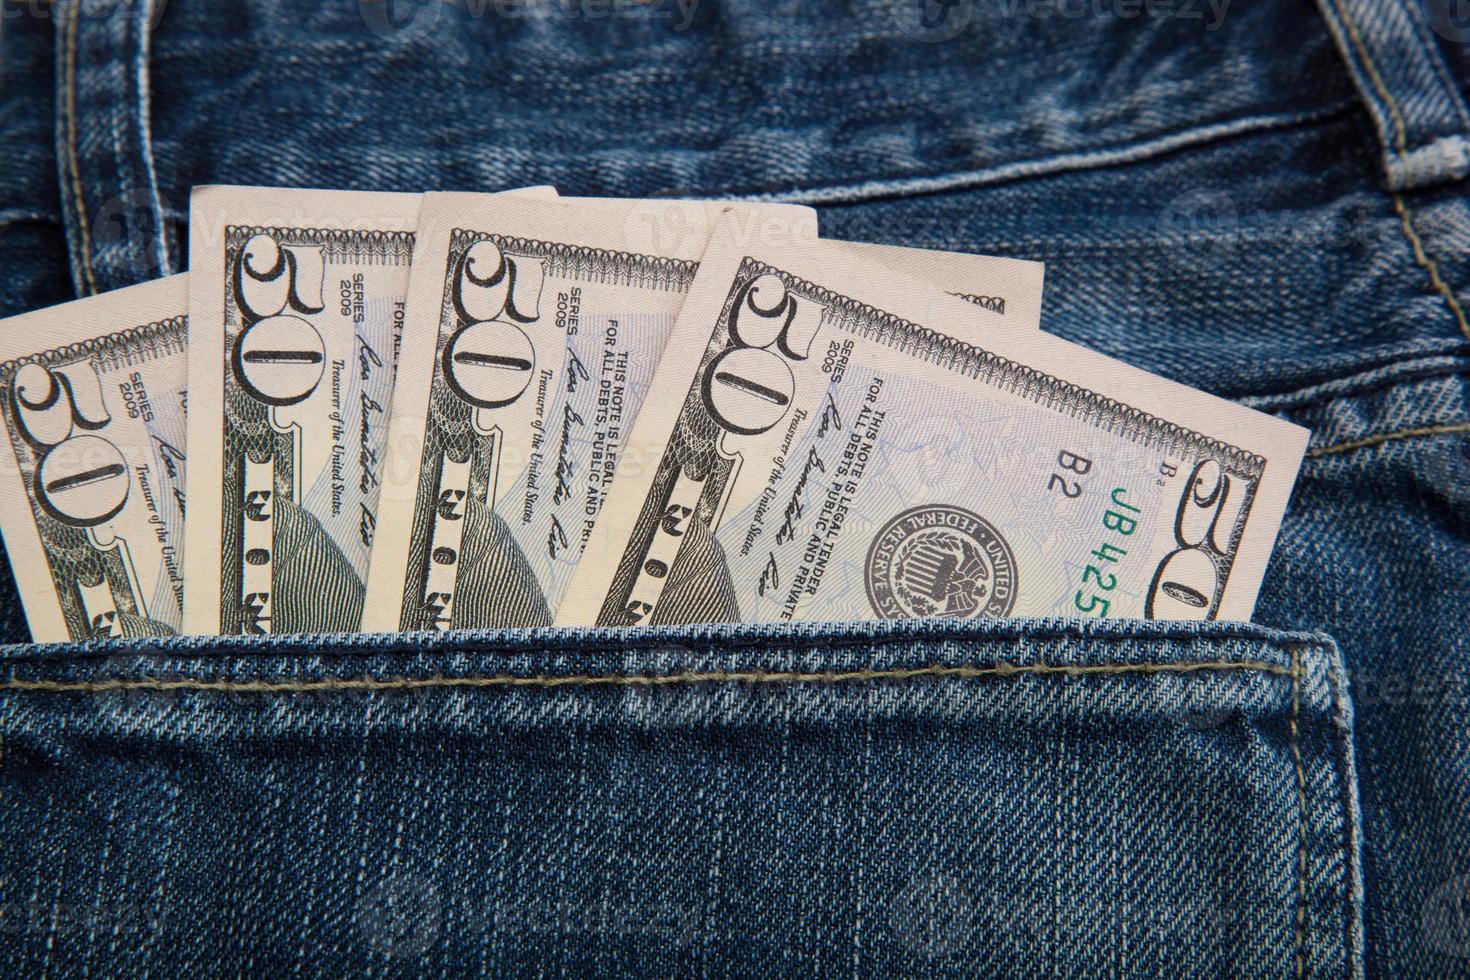 sedlar i jeansens bakficka. foto